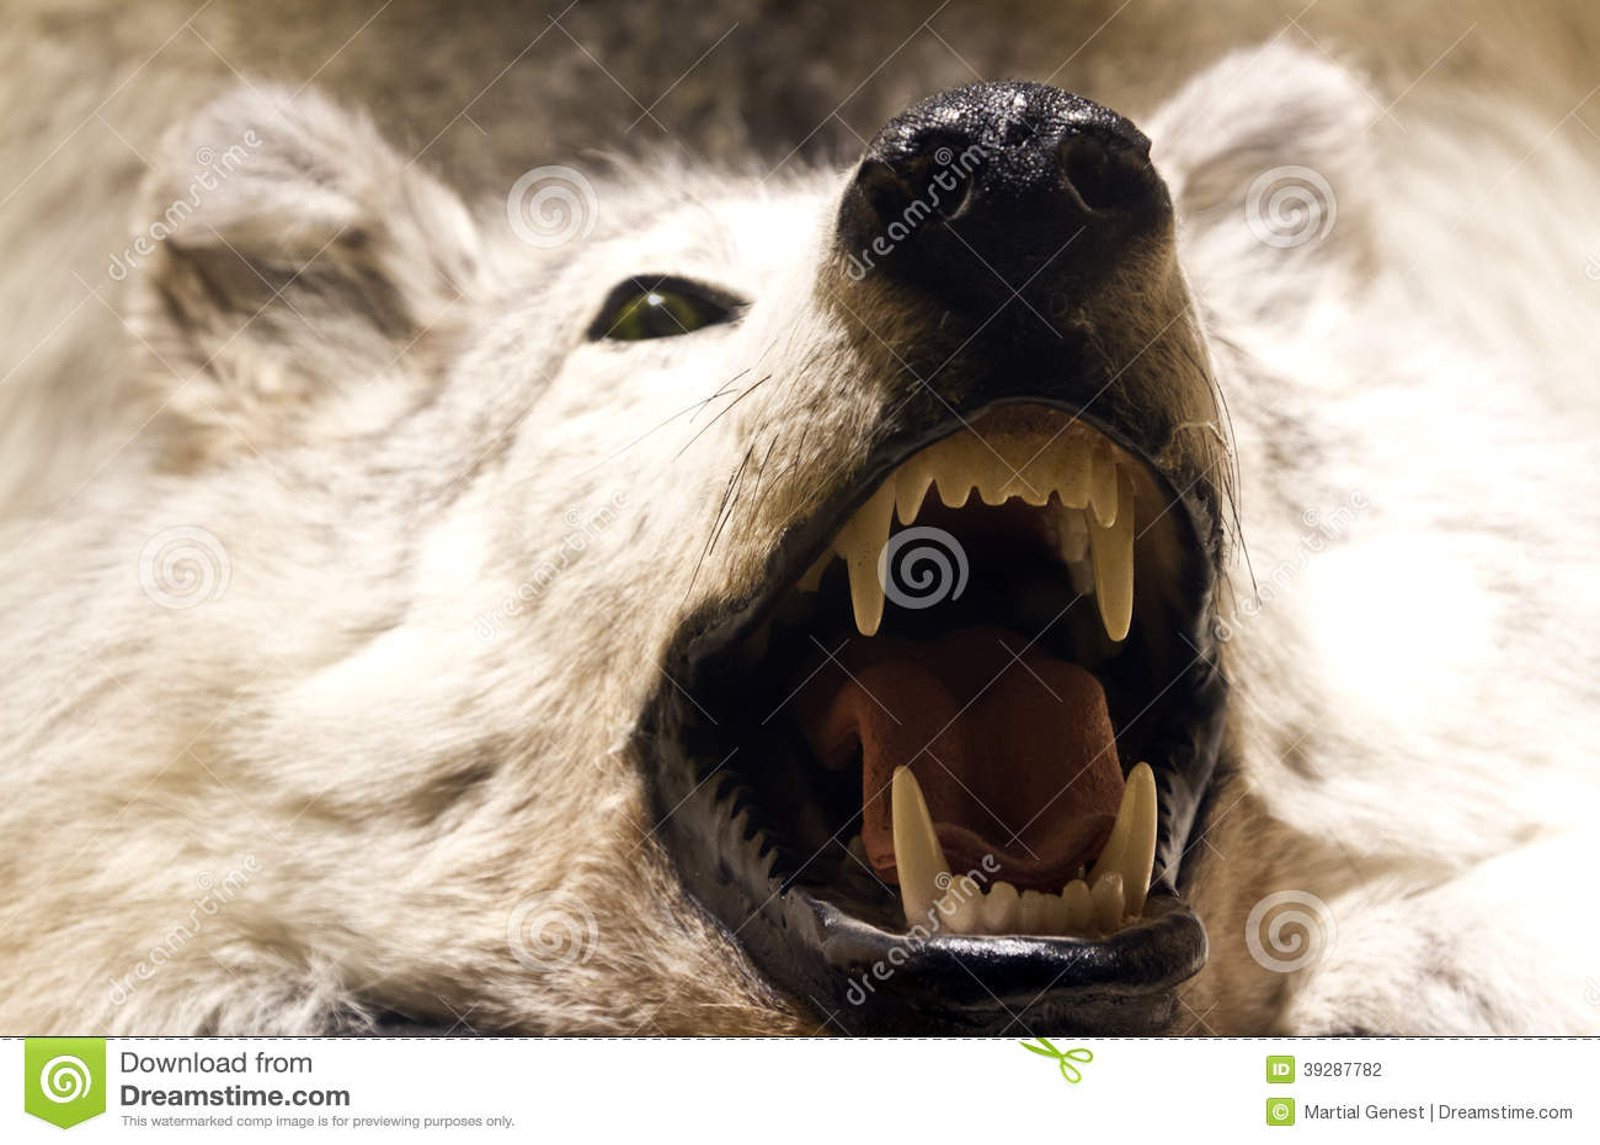 Maw Of An Animal